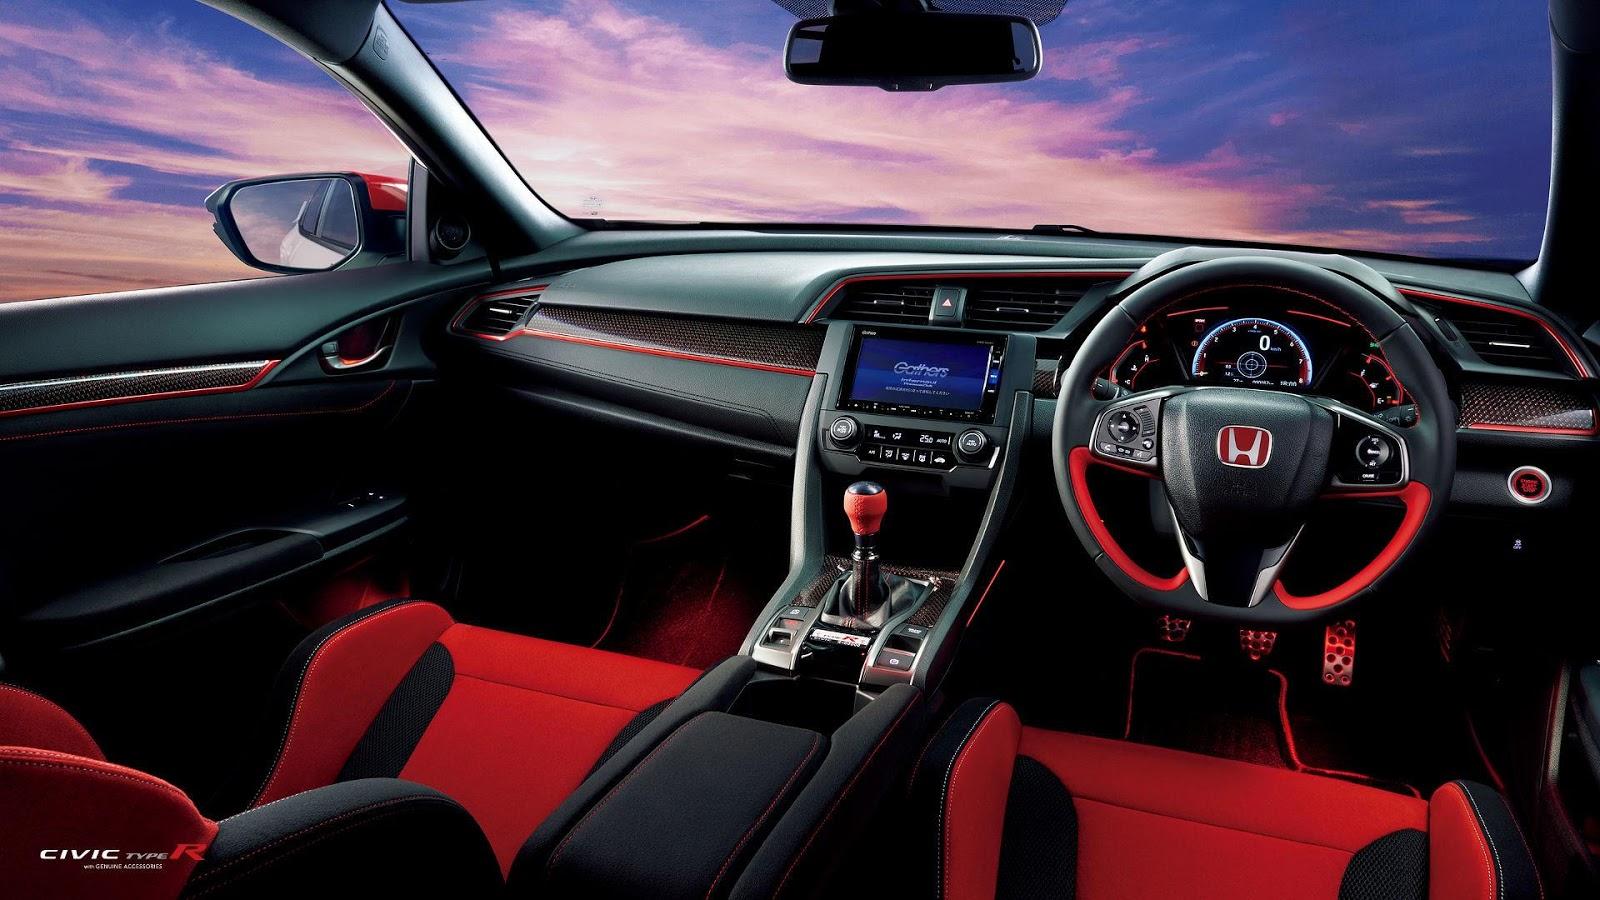 Jdm Honda Civic Type R Accessories Make It Even Wilder